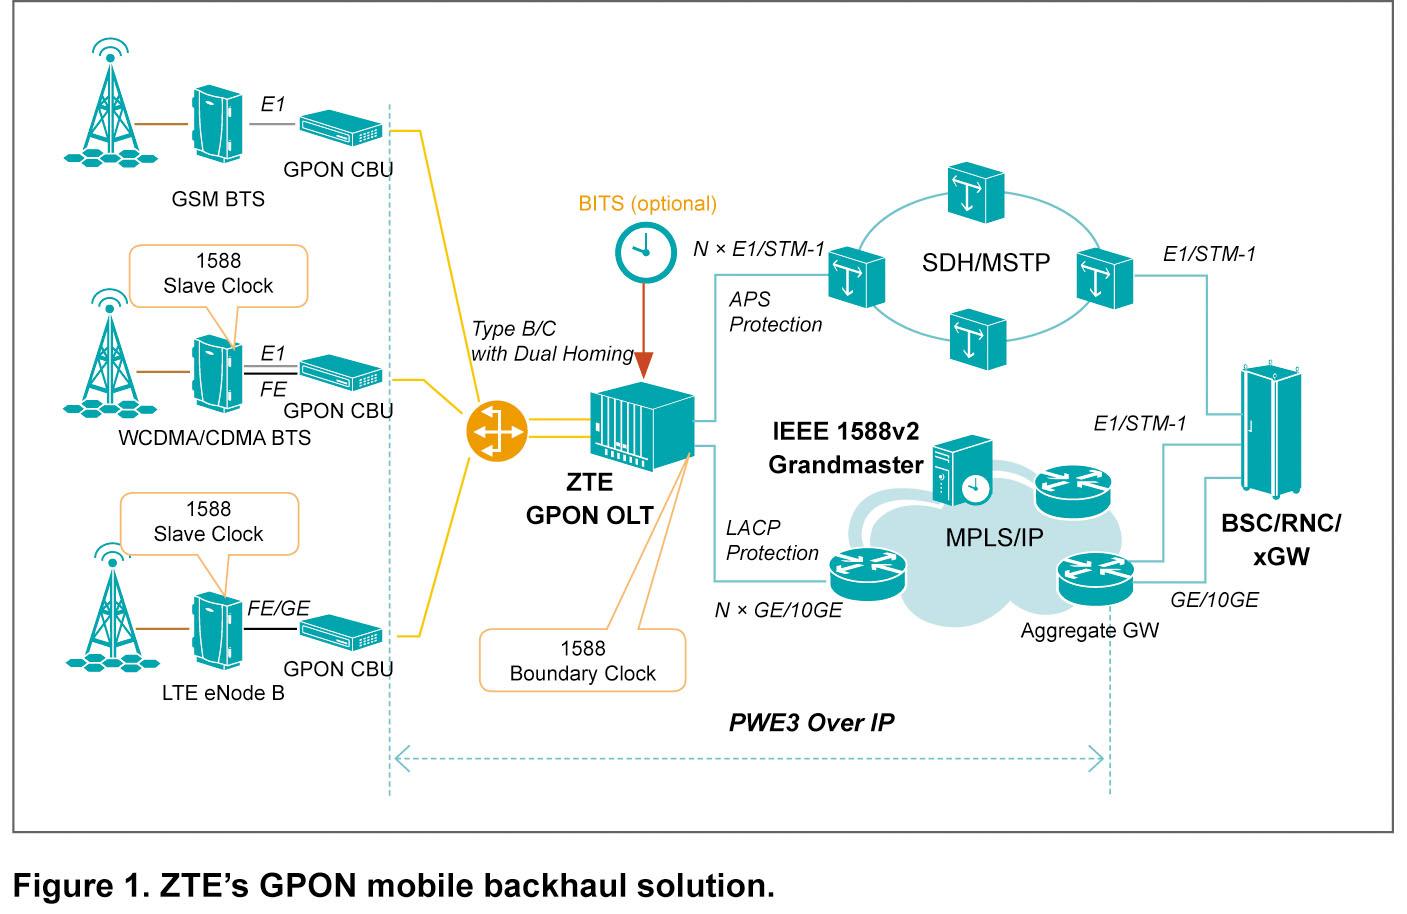 GPON Mobile Backhaul Solution - ztetechnologies